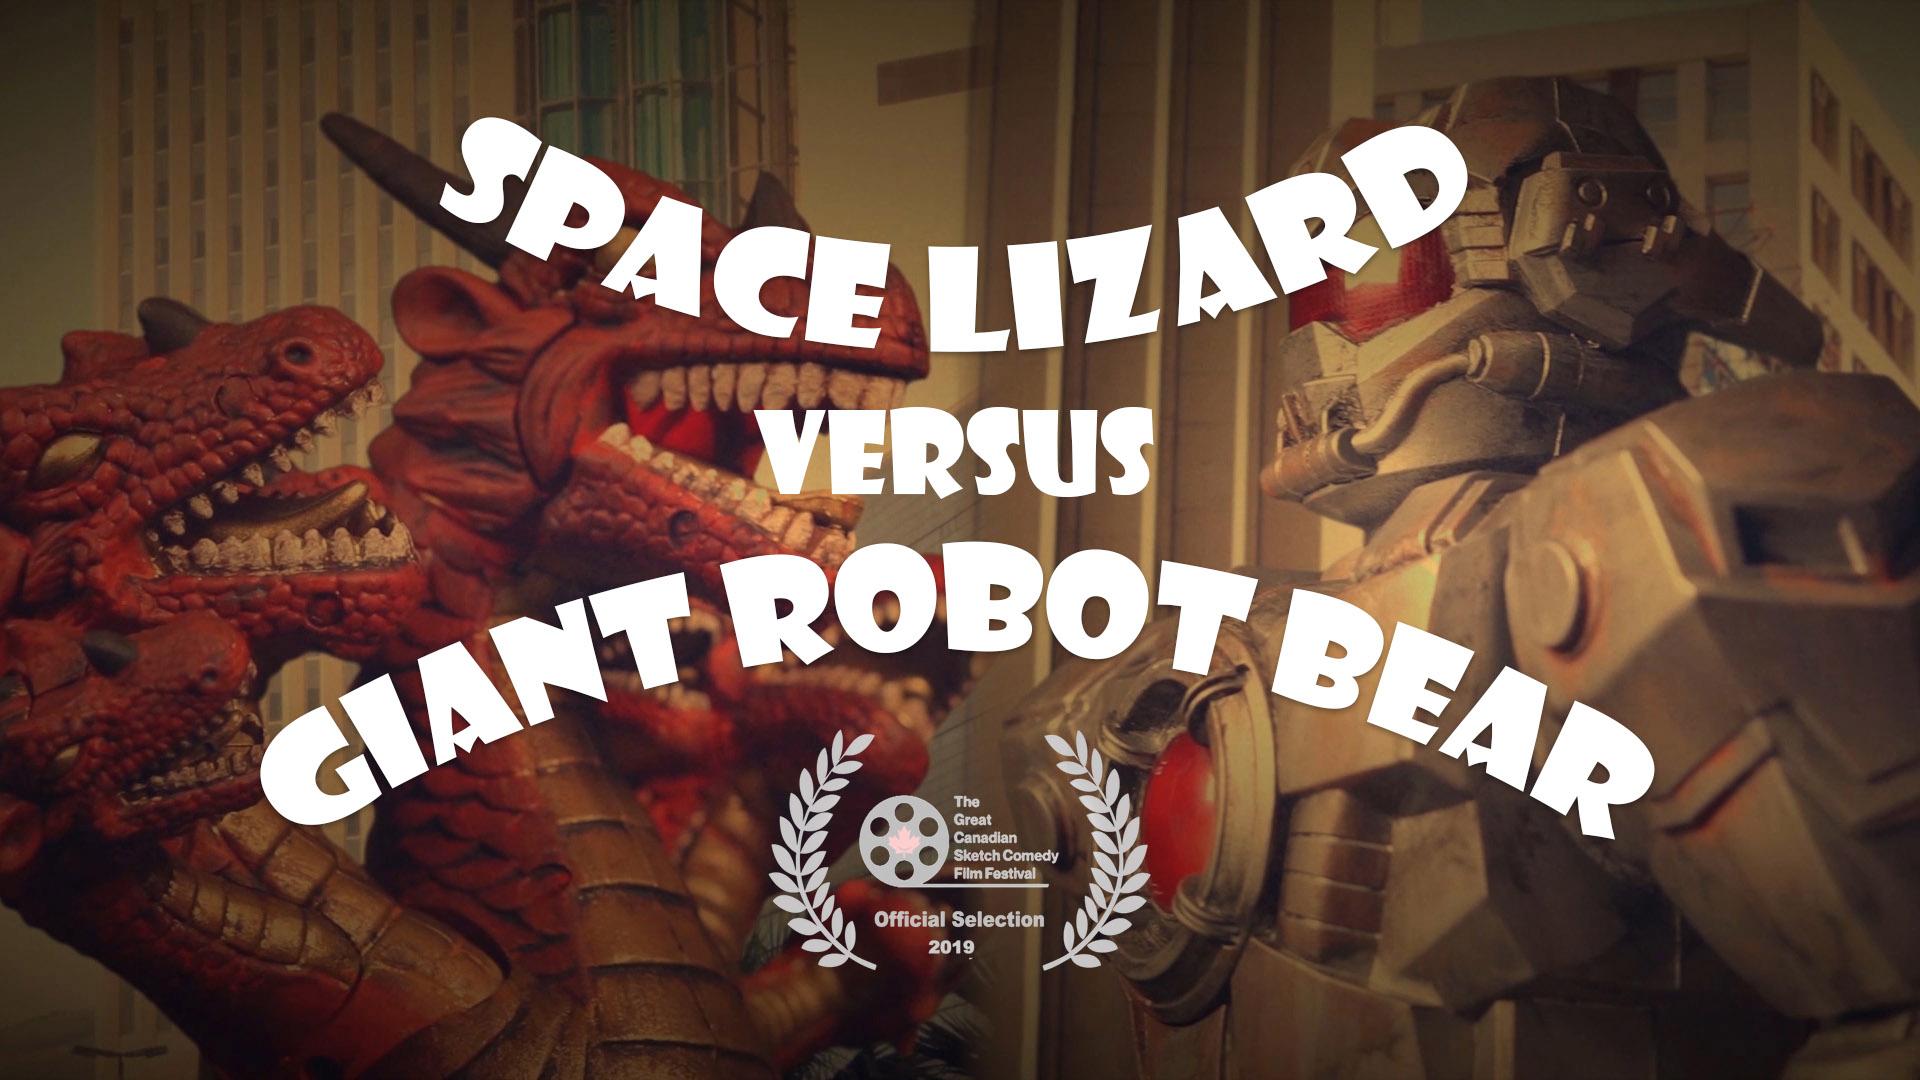 Space Lizard Versus Giant Robot Bear